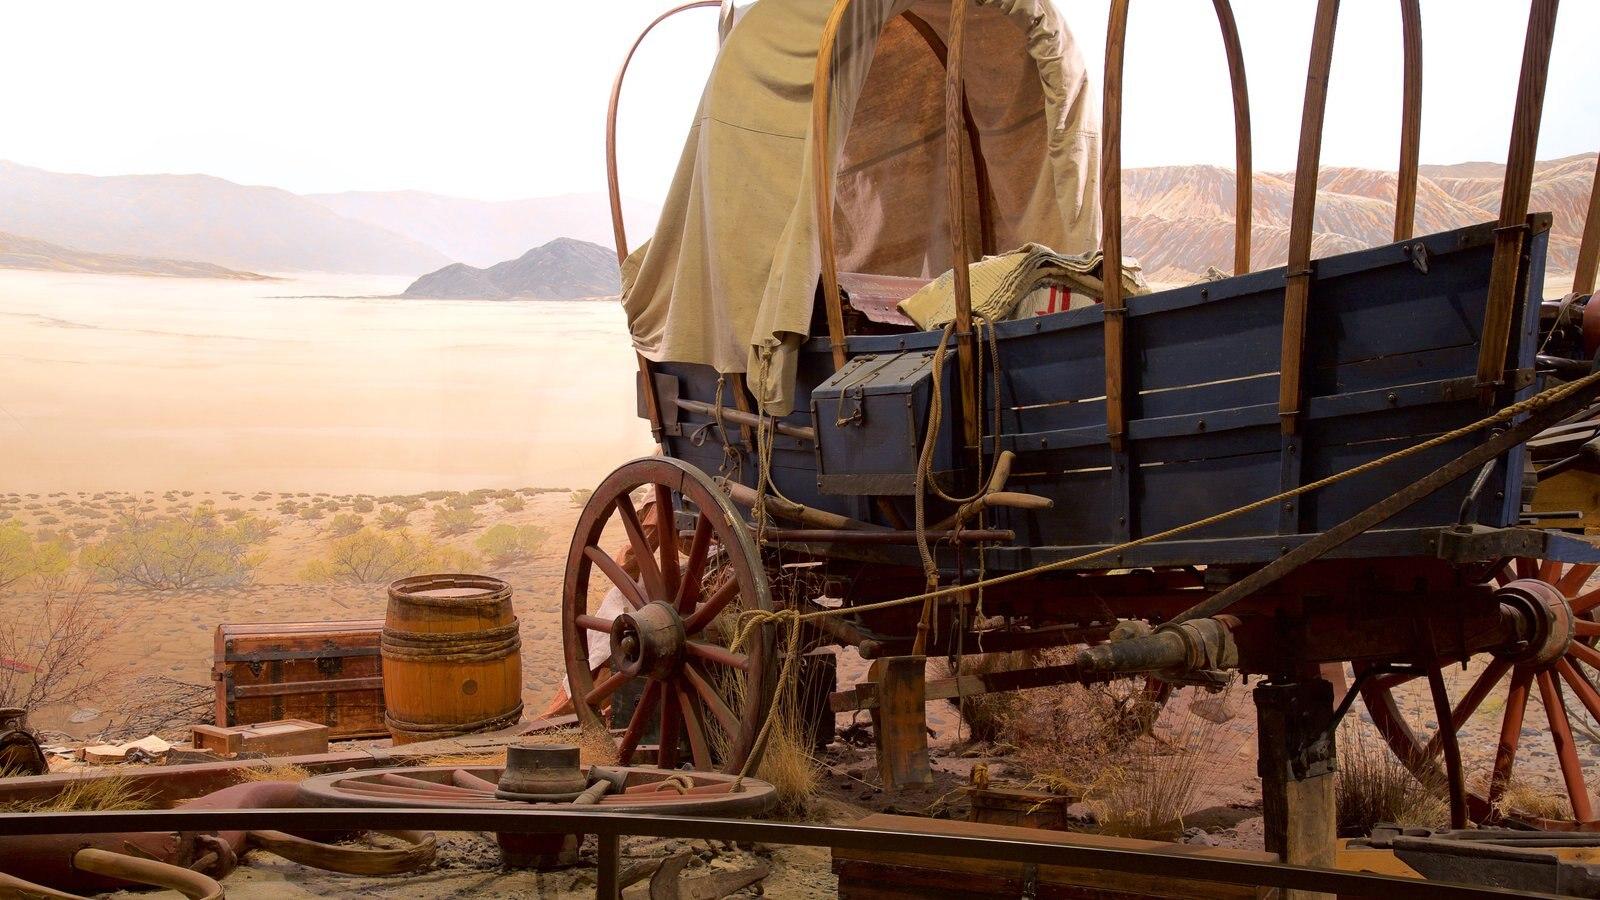 High Desert Museum ofreciendo vistas interiores